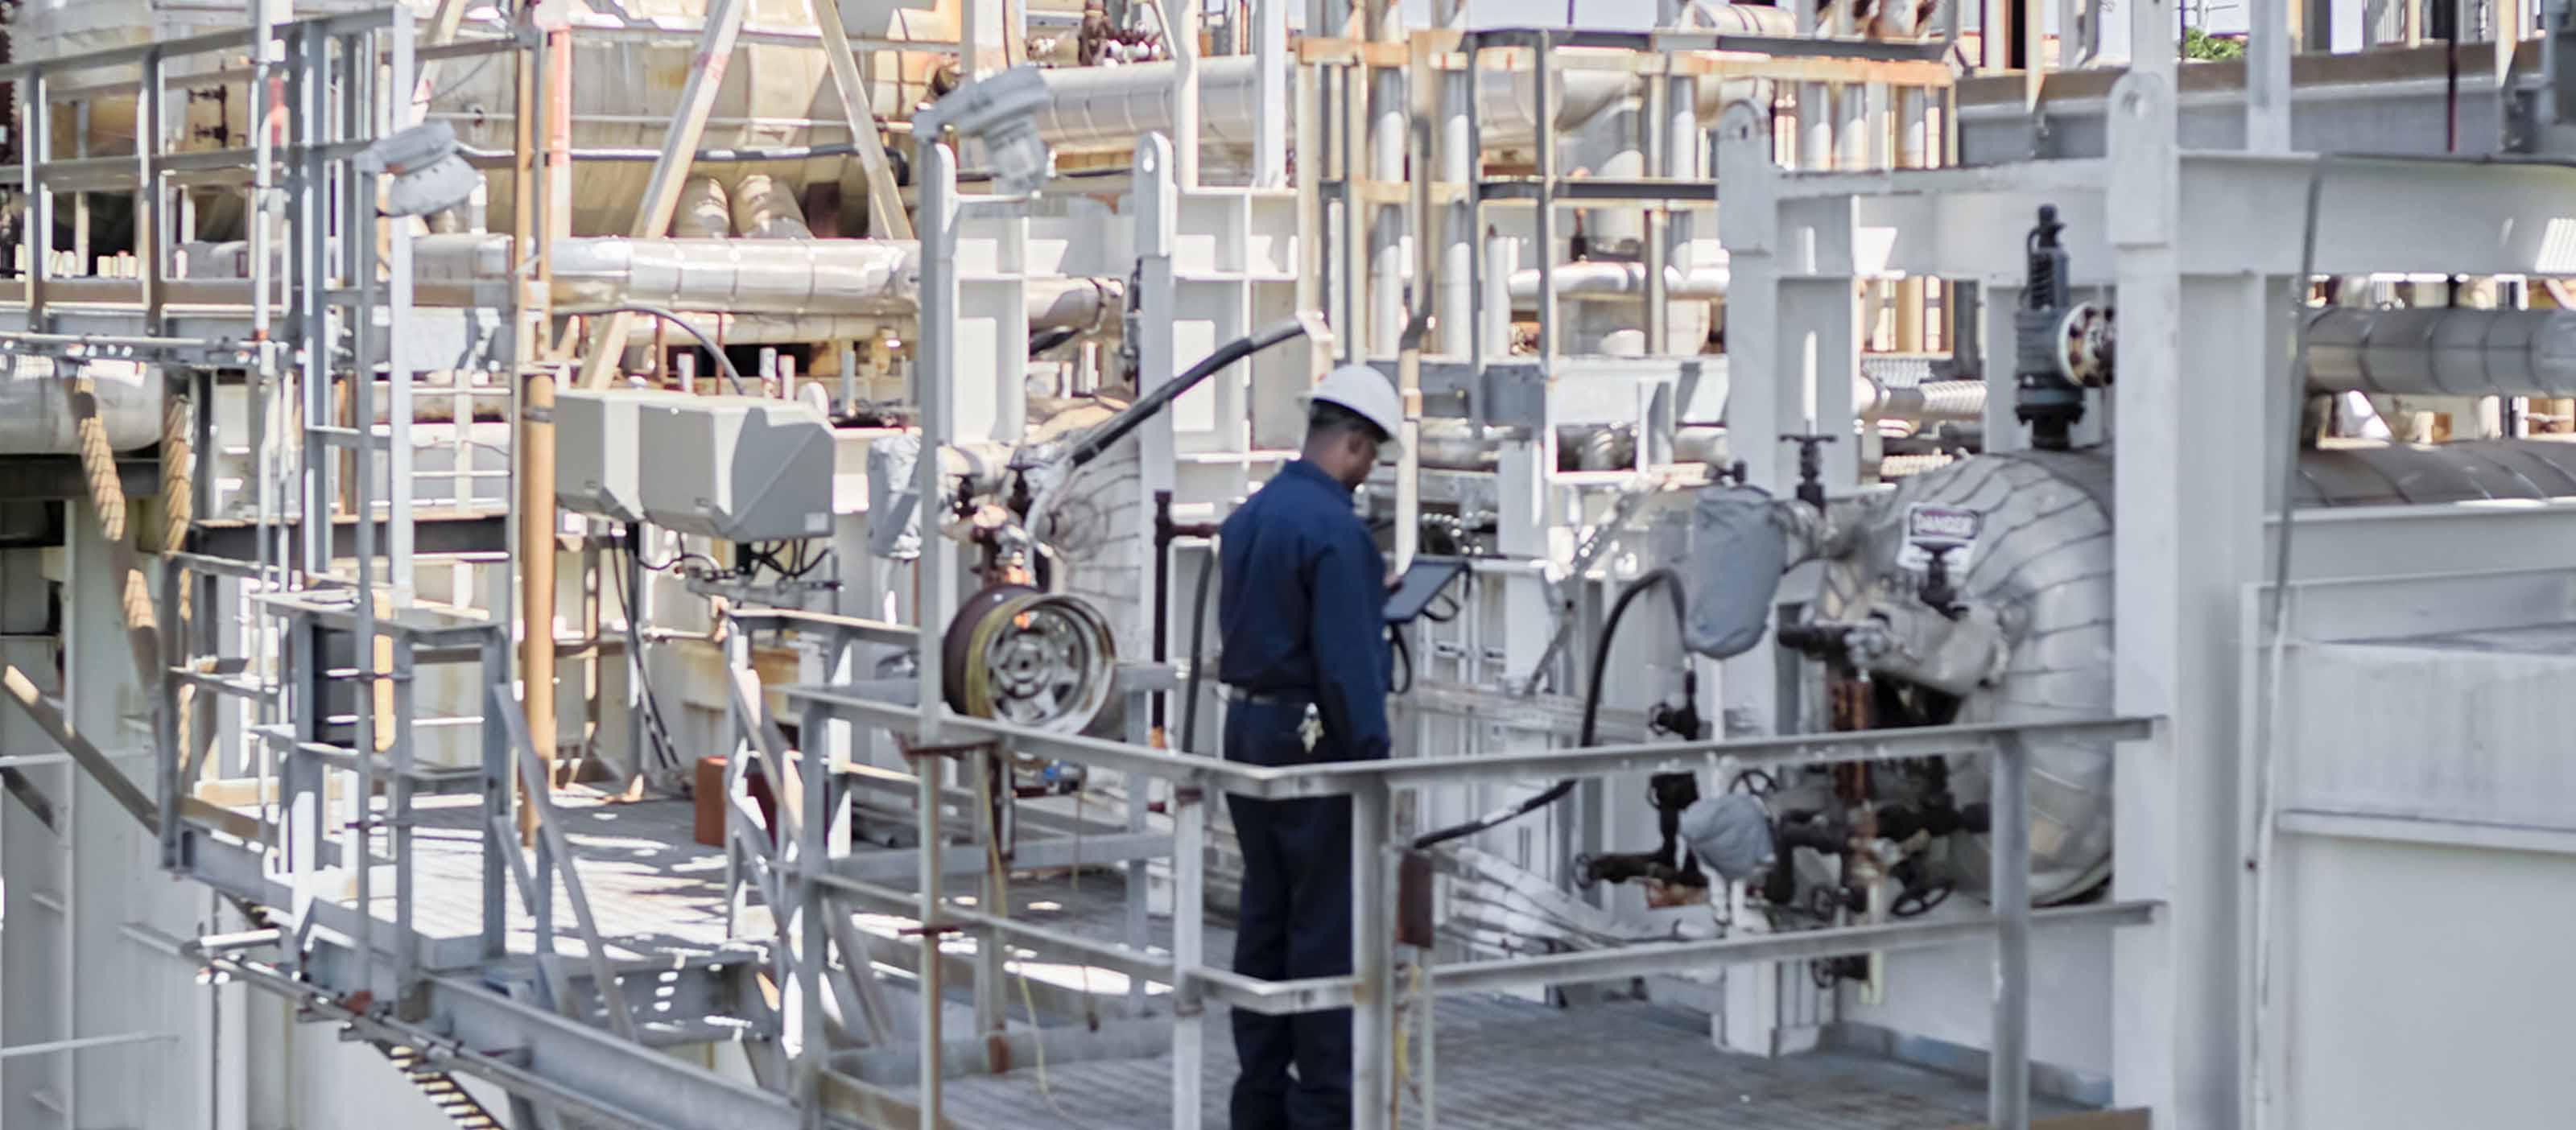 Software to help maintenance on gas power energy plants | GE Digital